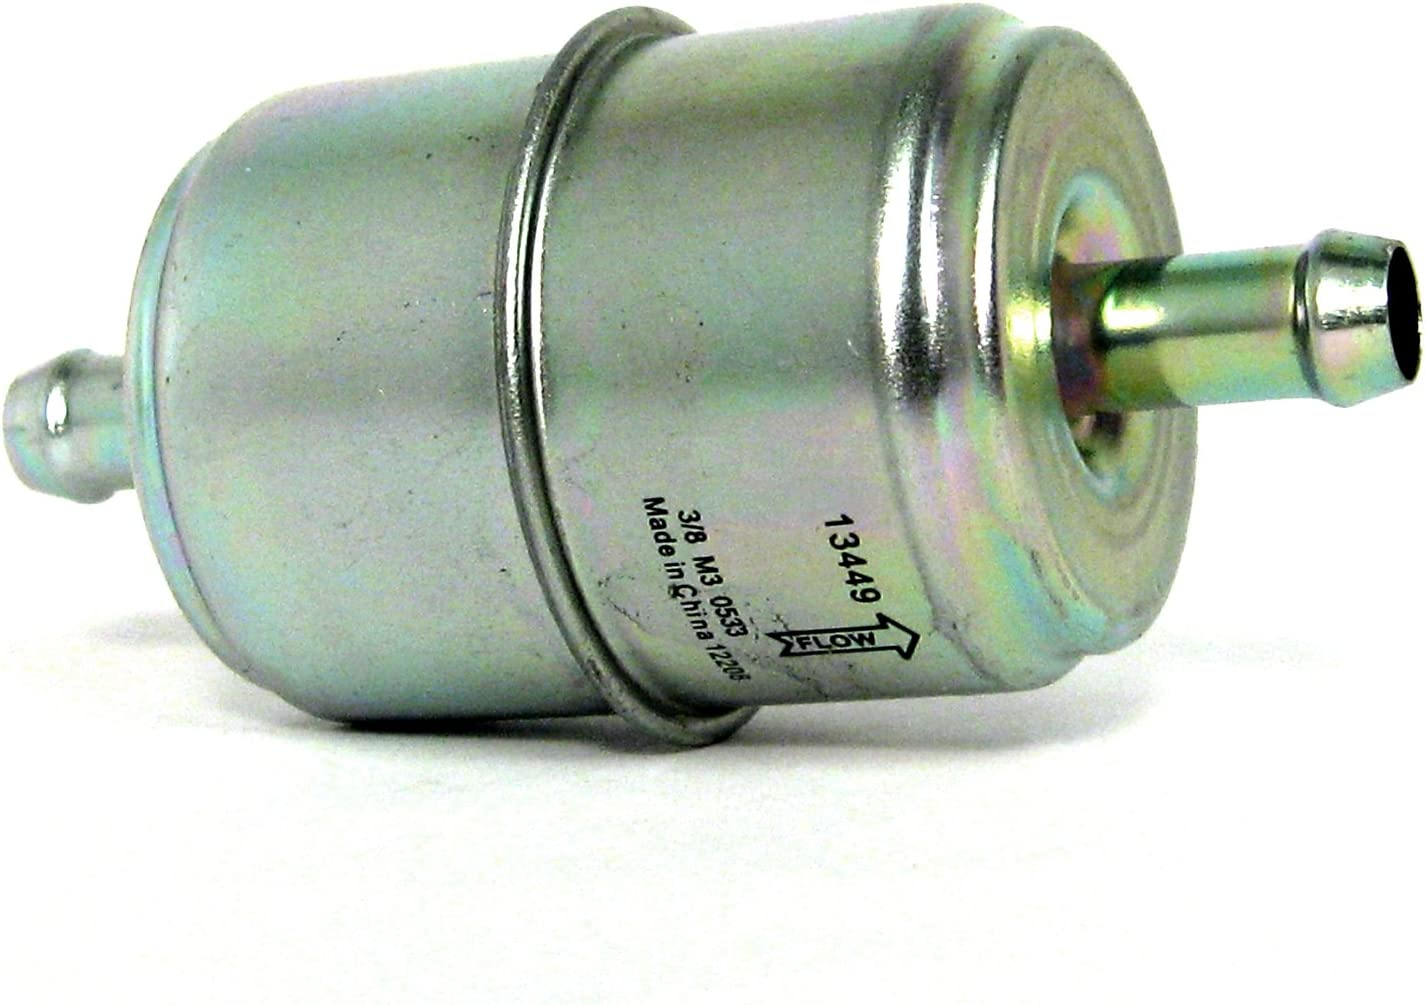 Amazon.com: GM Genuine Parts GF61P Fuel Filter: Automotive | Aftermarket Fuel Filter |  | Amazon.com